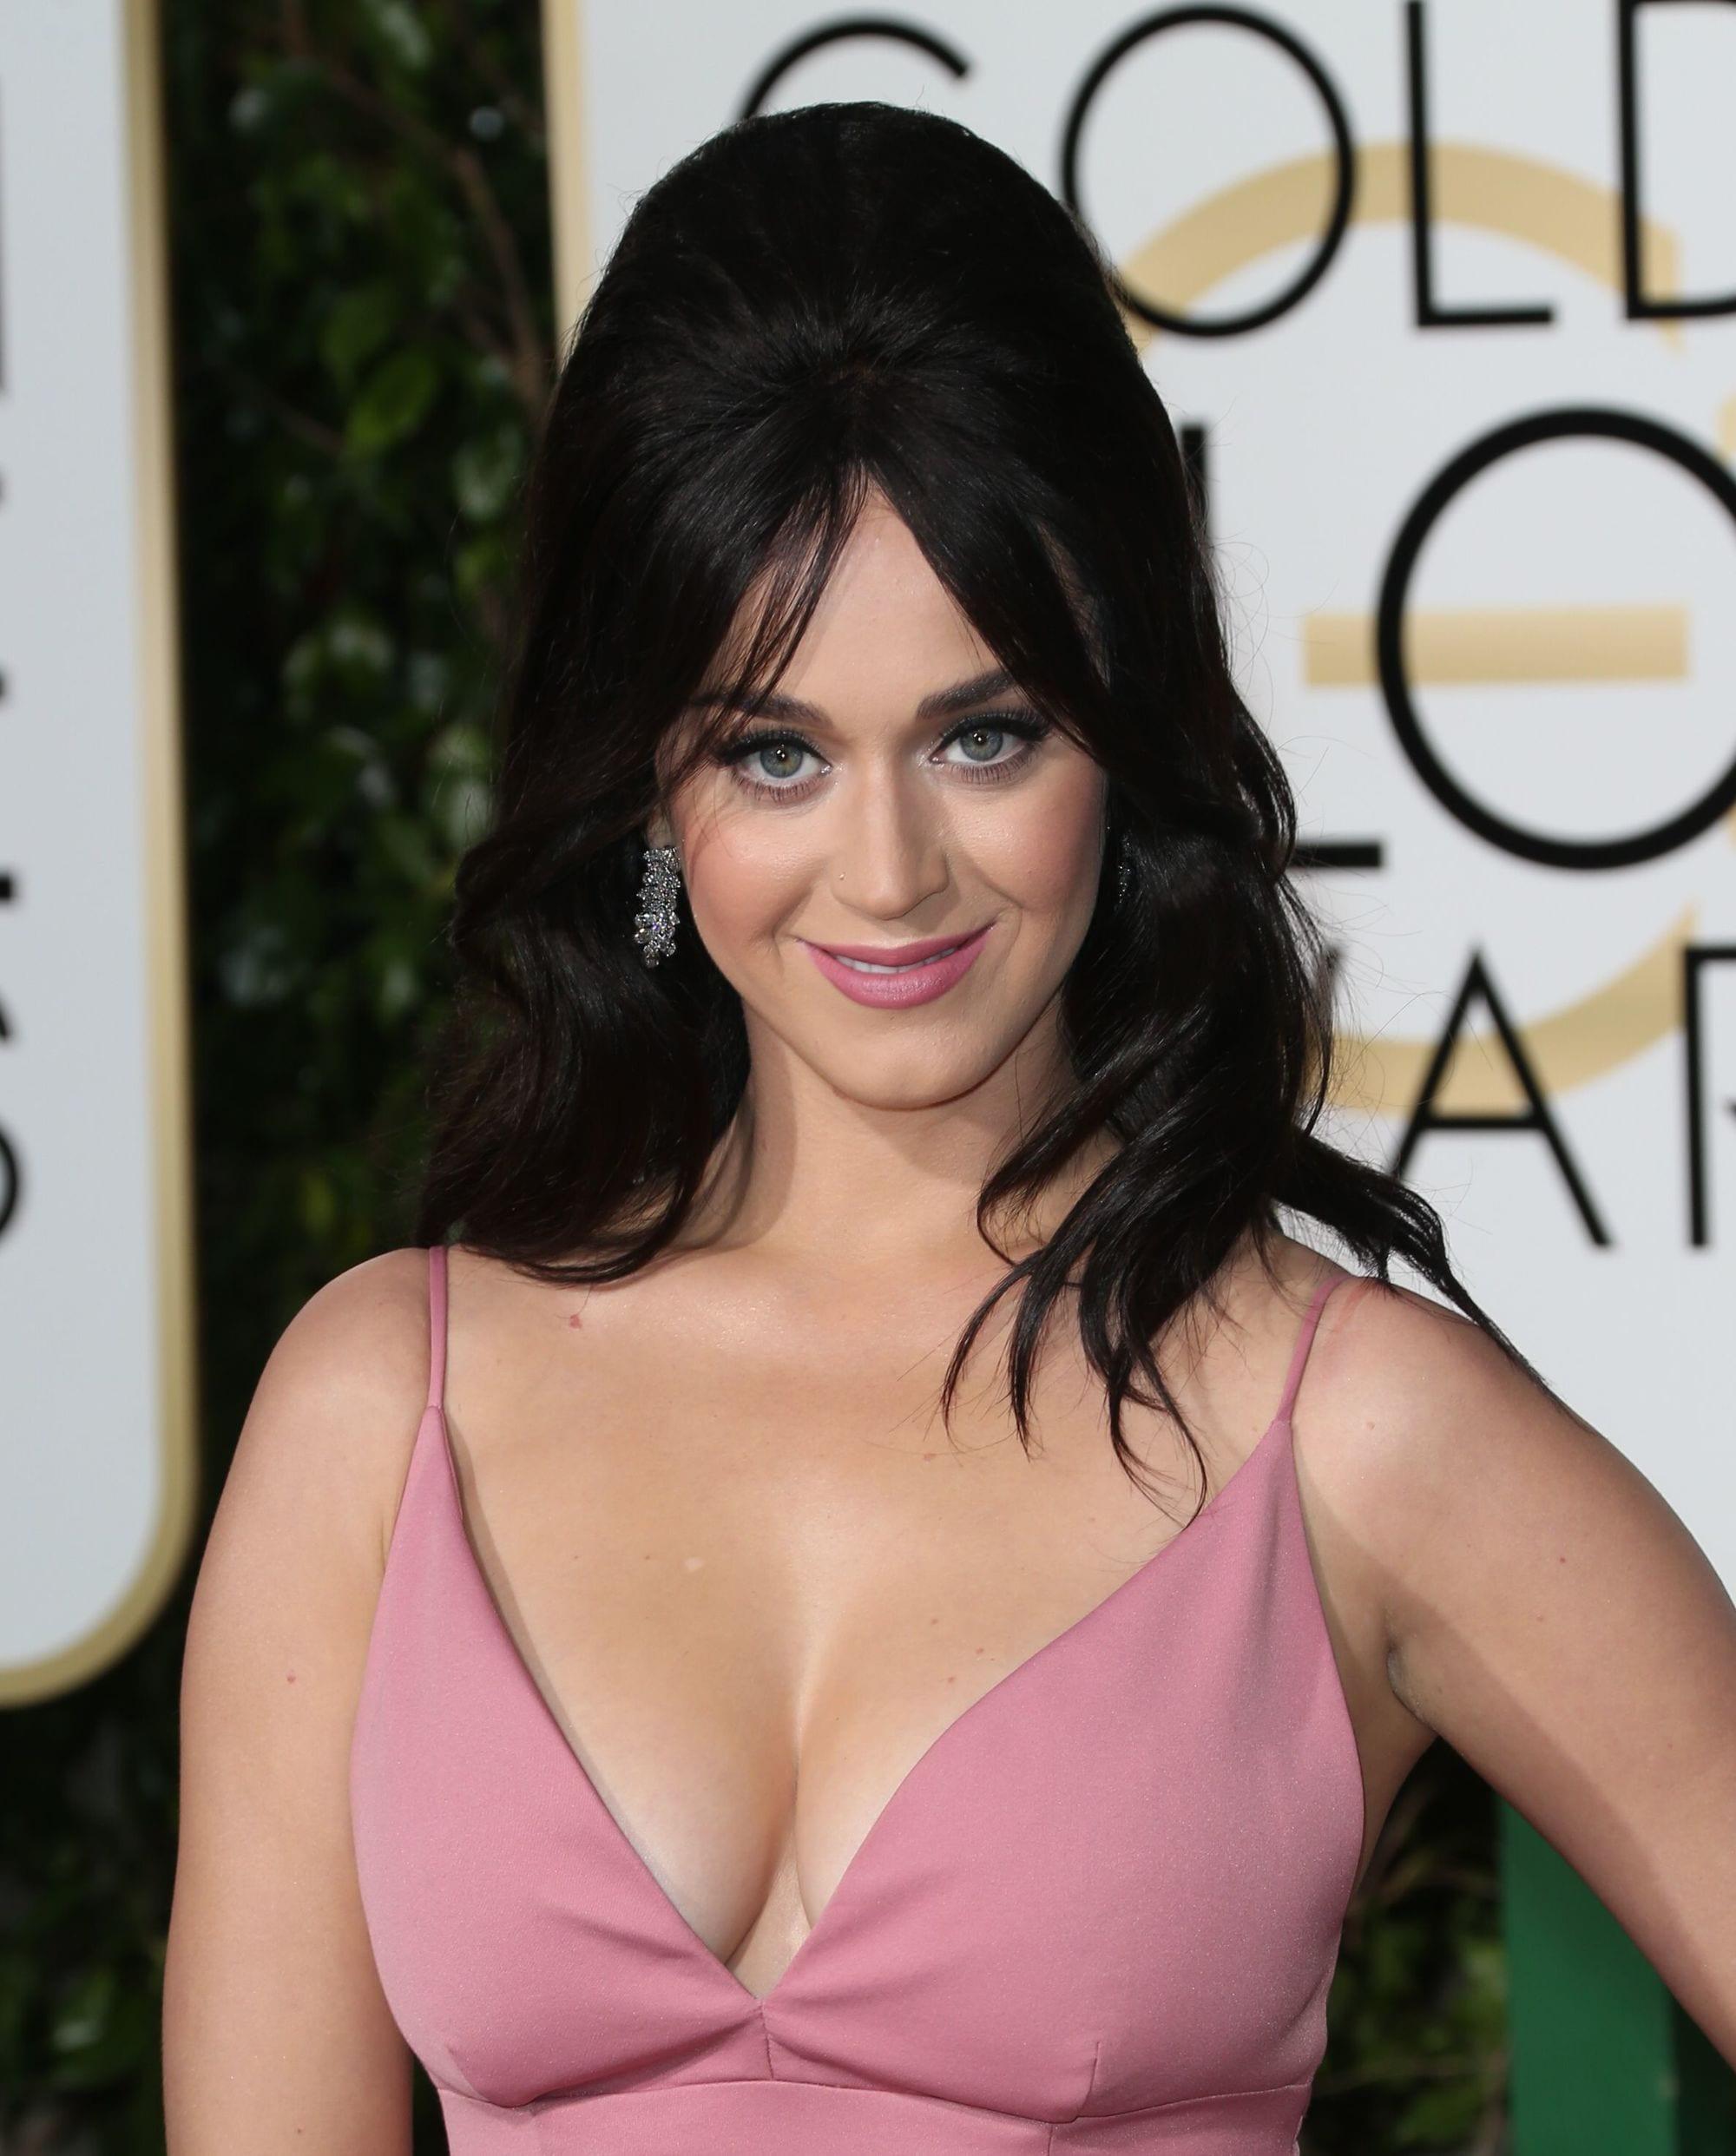 Katy Perry black hair in half-up, half-down '60s inspired bardot bangs